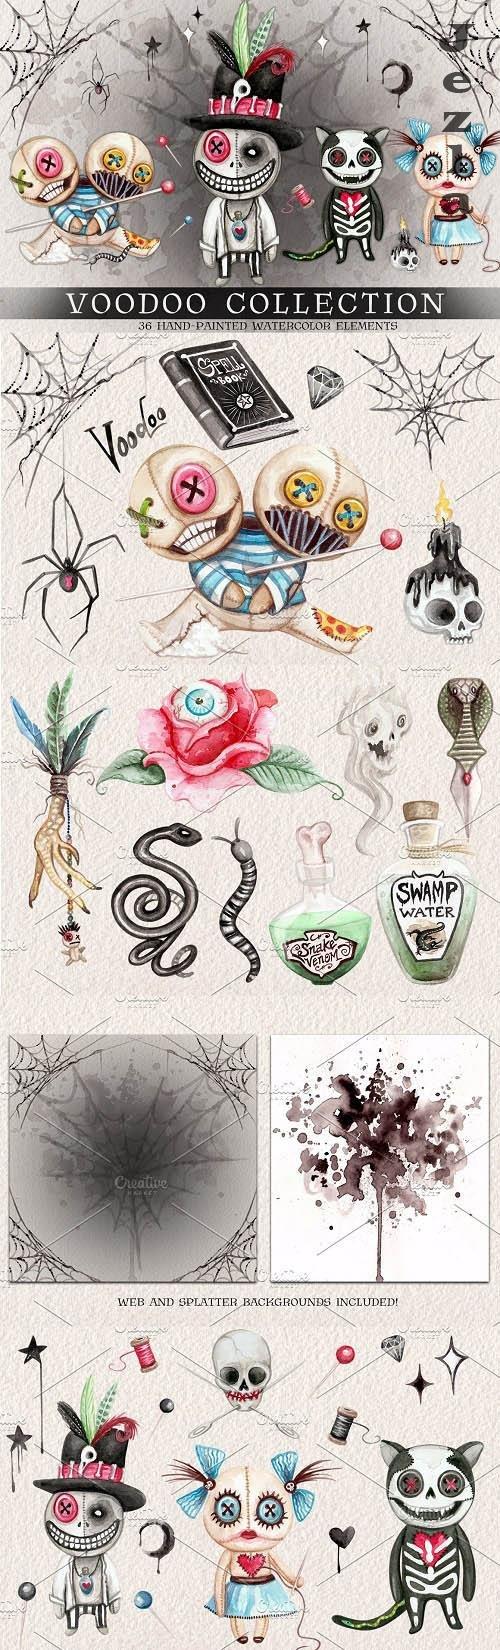 Watercolor Voodoo Collection - 4078139